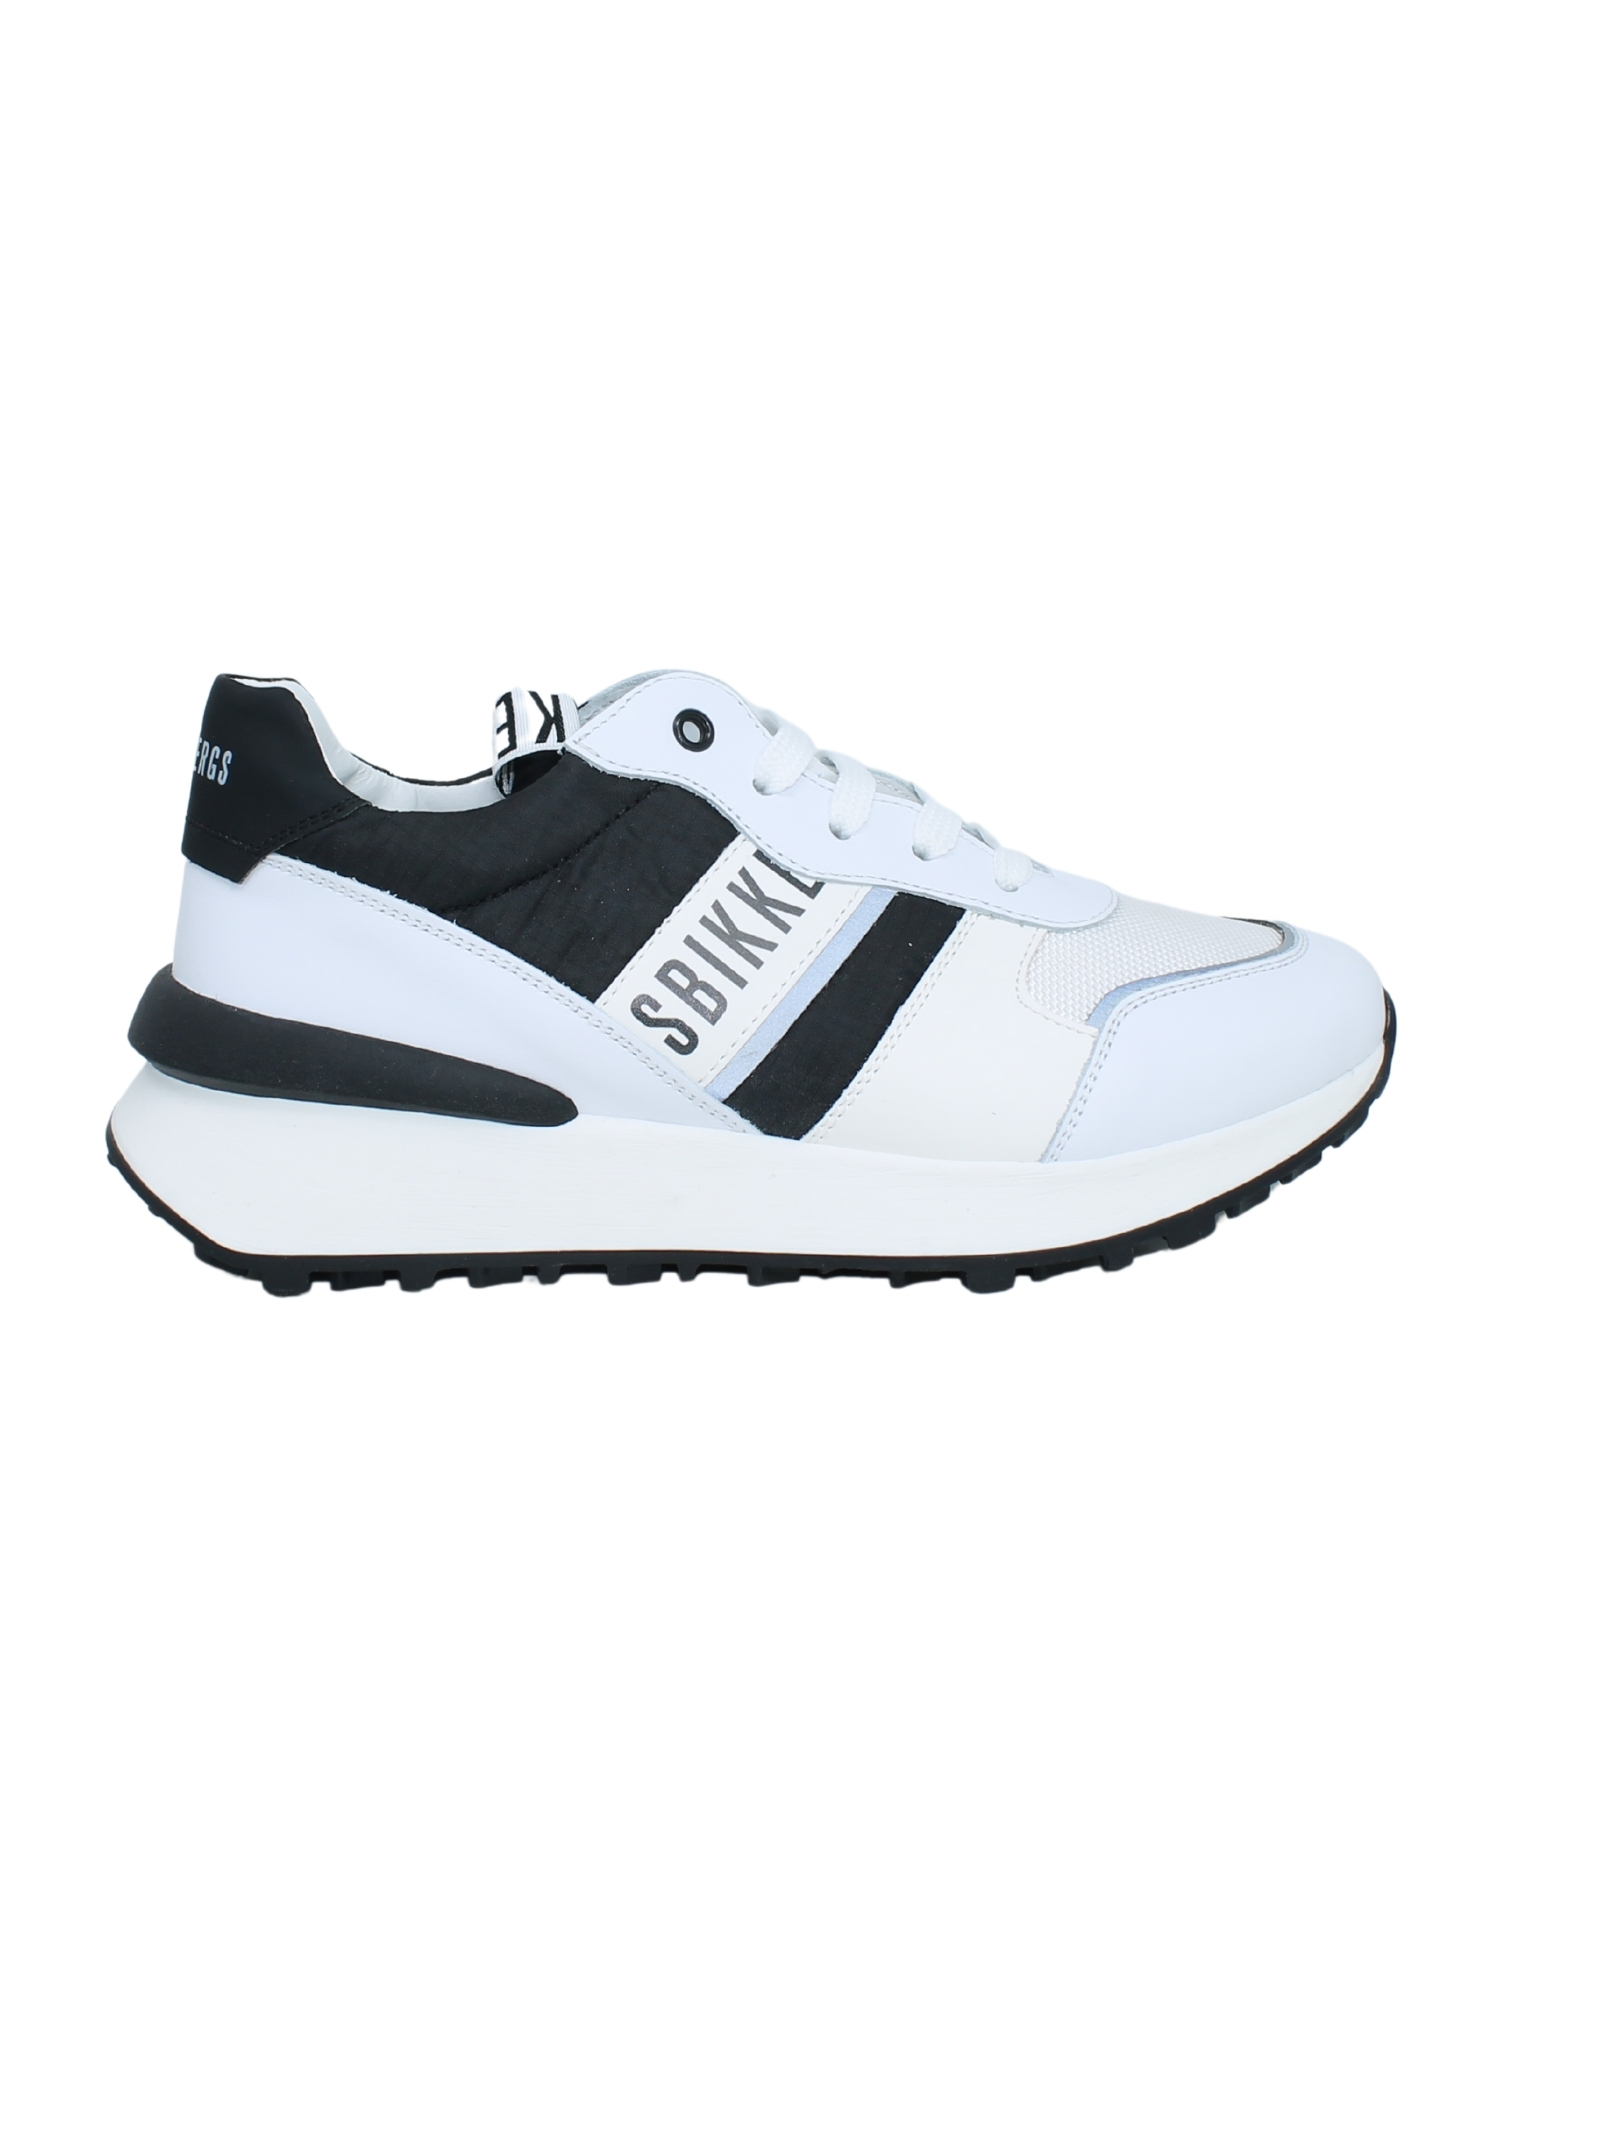 BIKKEMBERGS KIDS   Sneakers   K4B4206810030X002